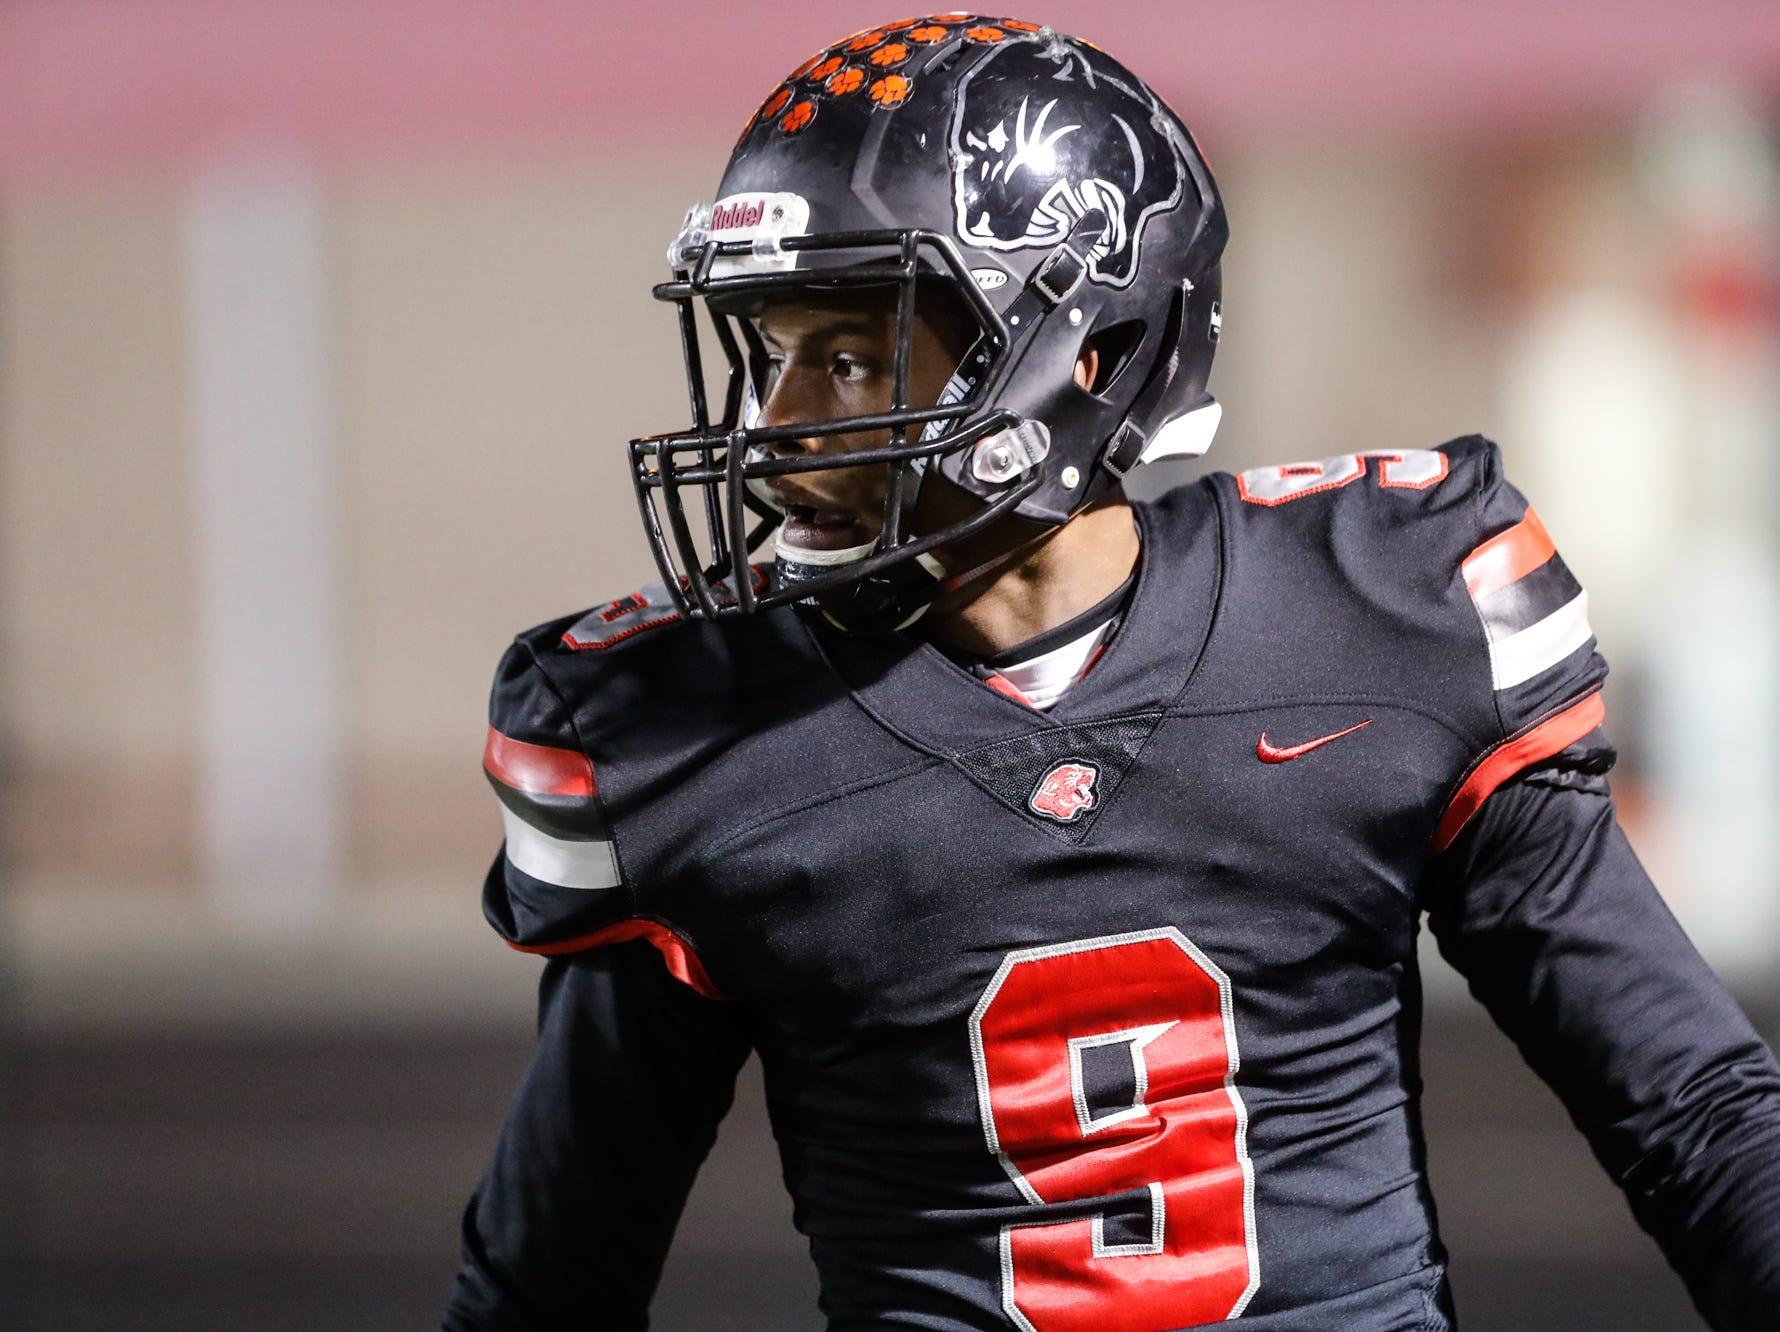 North Central High School Panthers Tre'von Elliott (9), celebrates a touchdown, during a regional finals game against the Warren Central High School Warriors at North Central High School on Friday, Nov. 9, 2018.